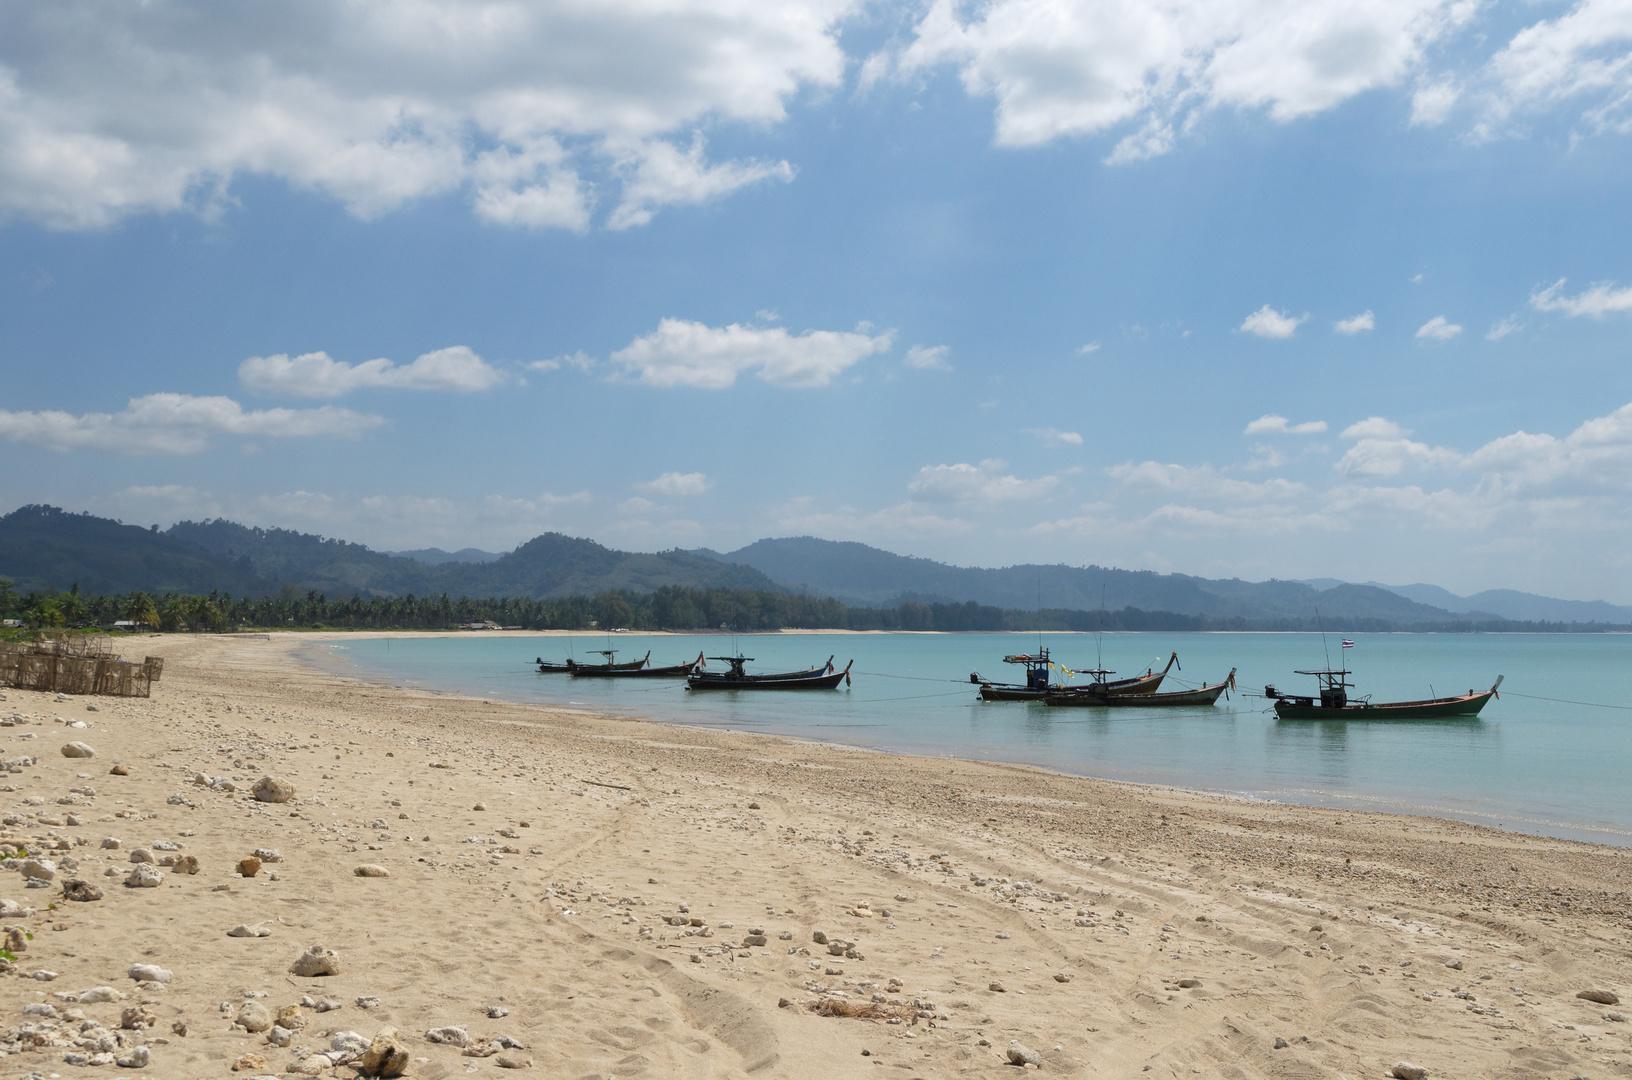 Thabtawan Beach, Amphoe Takua Pa, Phang Nga, Thailand, Januar 2013